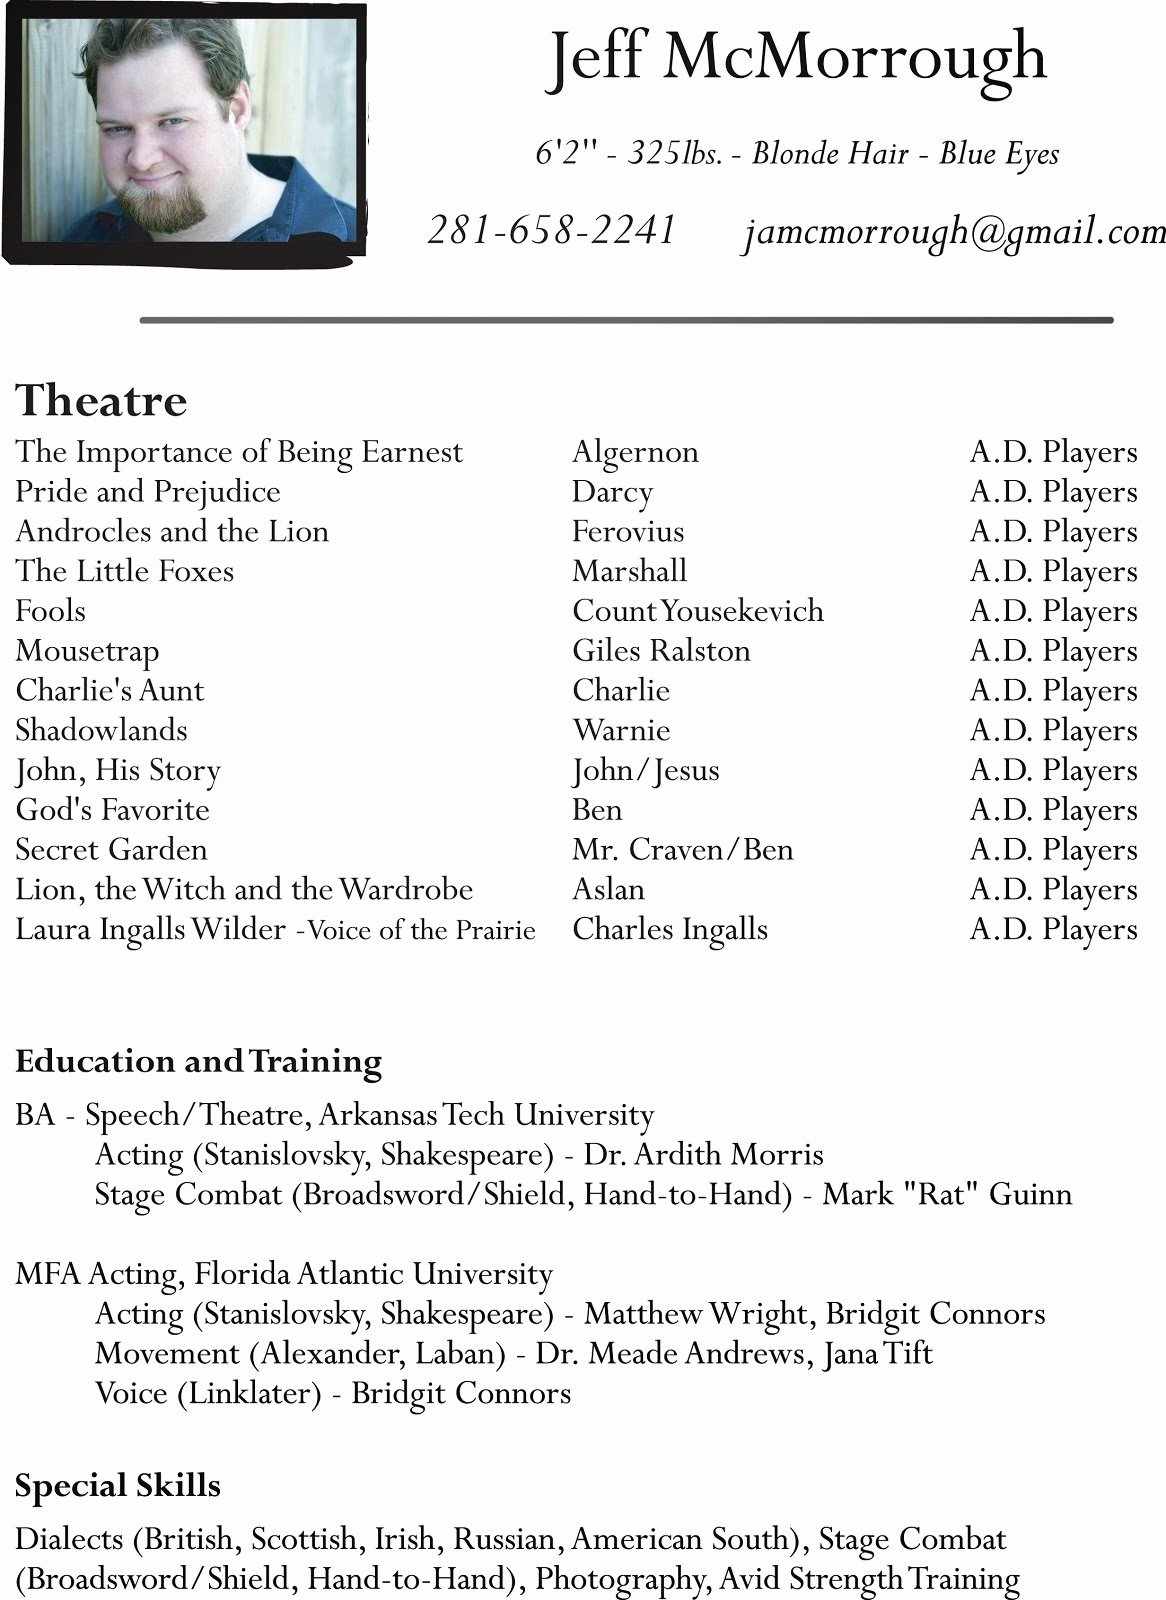 Beginner Actor Resume Template Lovely Talent Star Acting Resume Actor Beginner Kids theatre